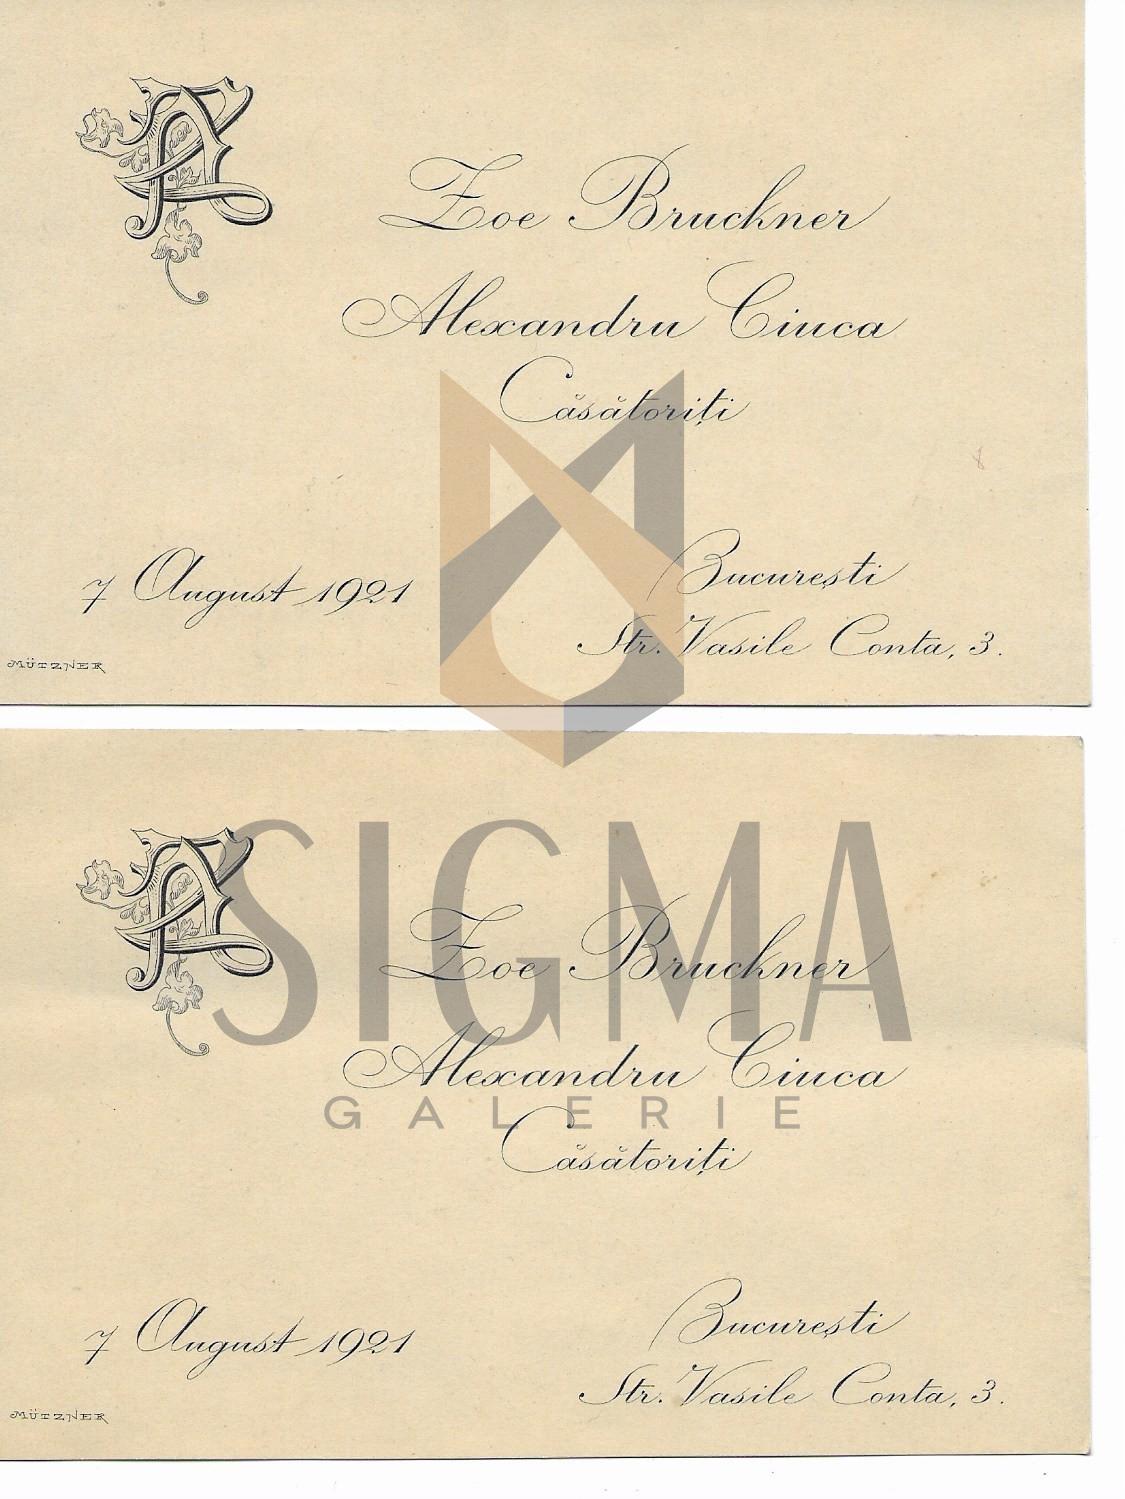 INVITATII DE NUNTA, GRAFICA EXECUTATA DE PICTORUL S. MUTZNER, 1921